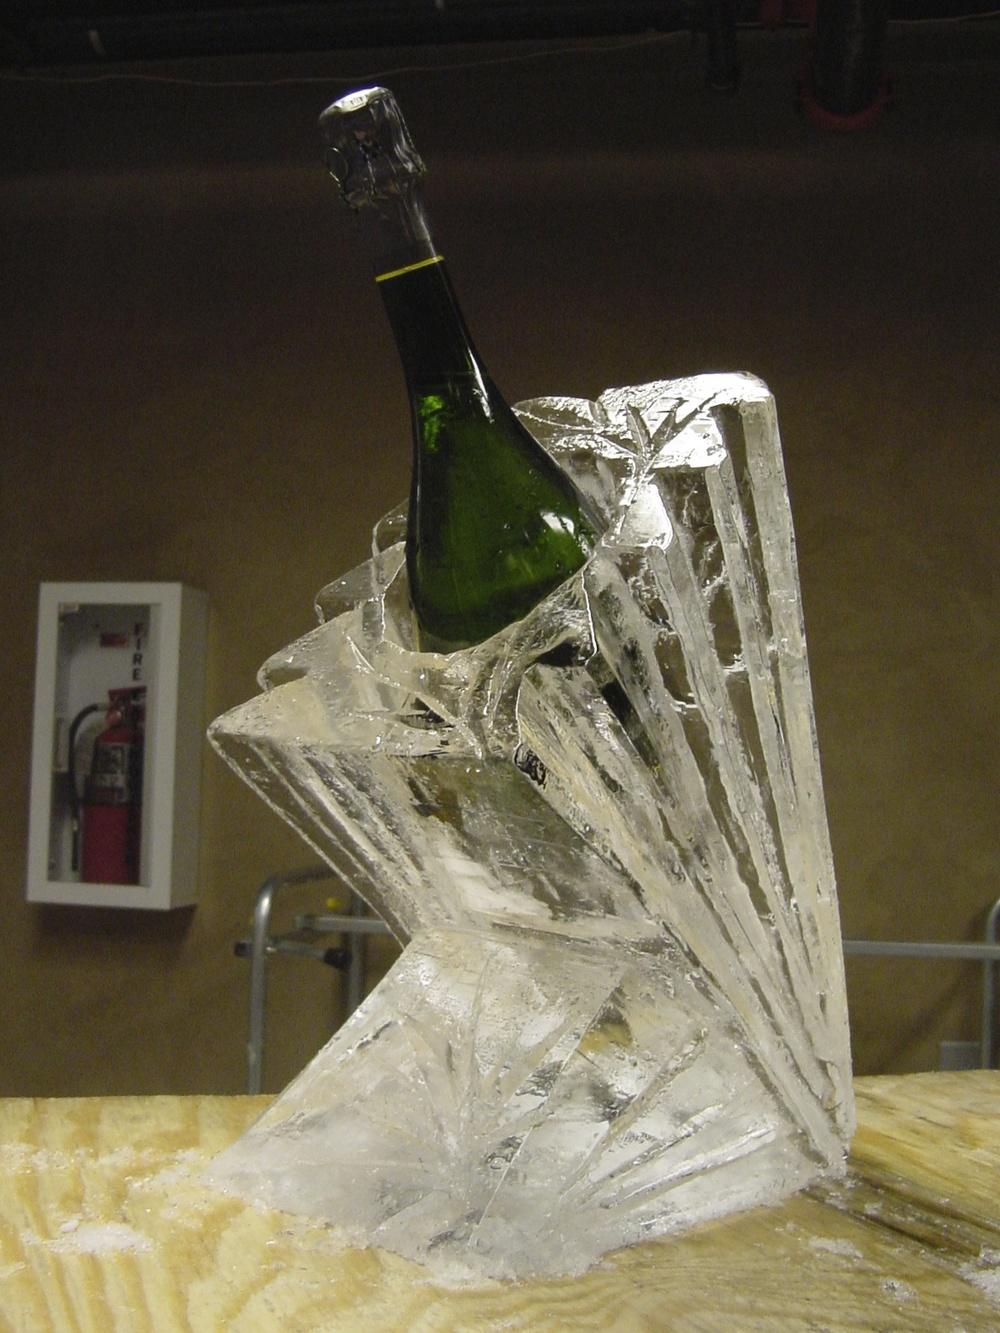 4-1-02 Champagne Chiller 4.jpg